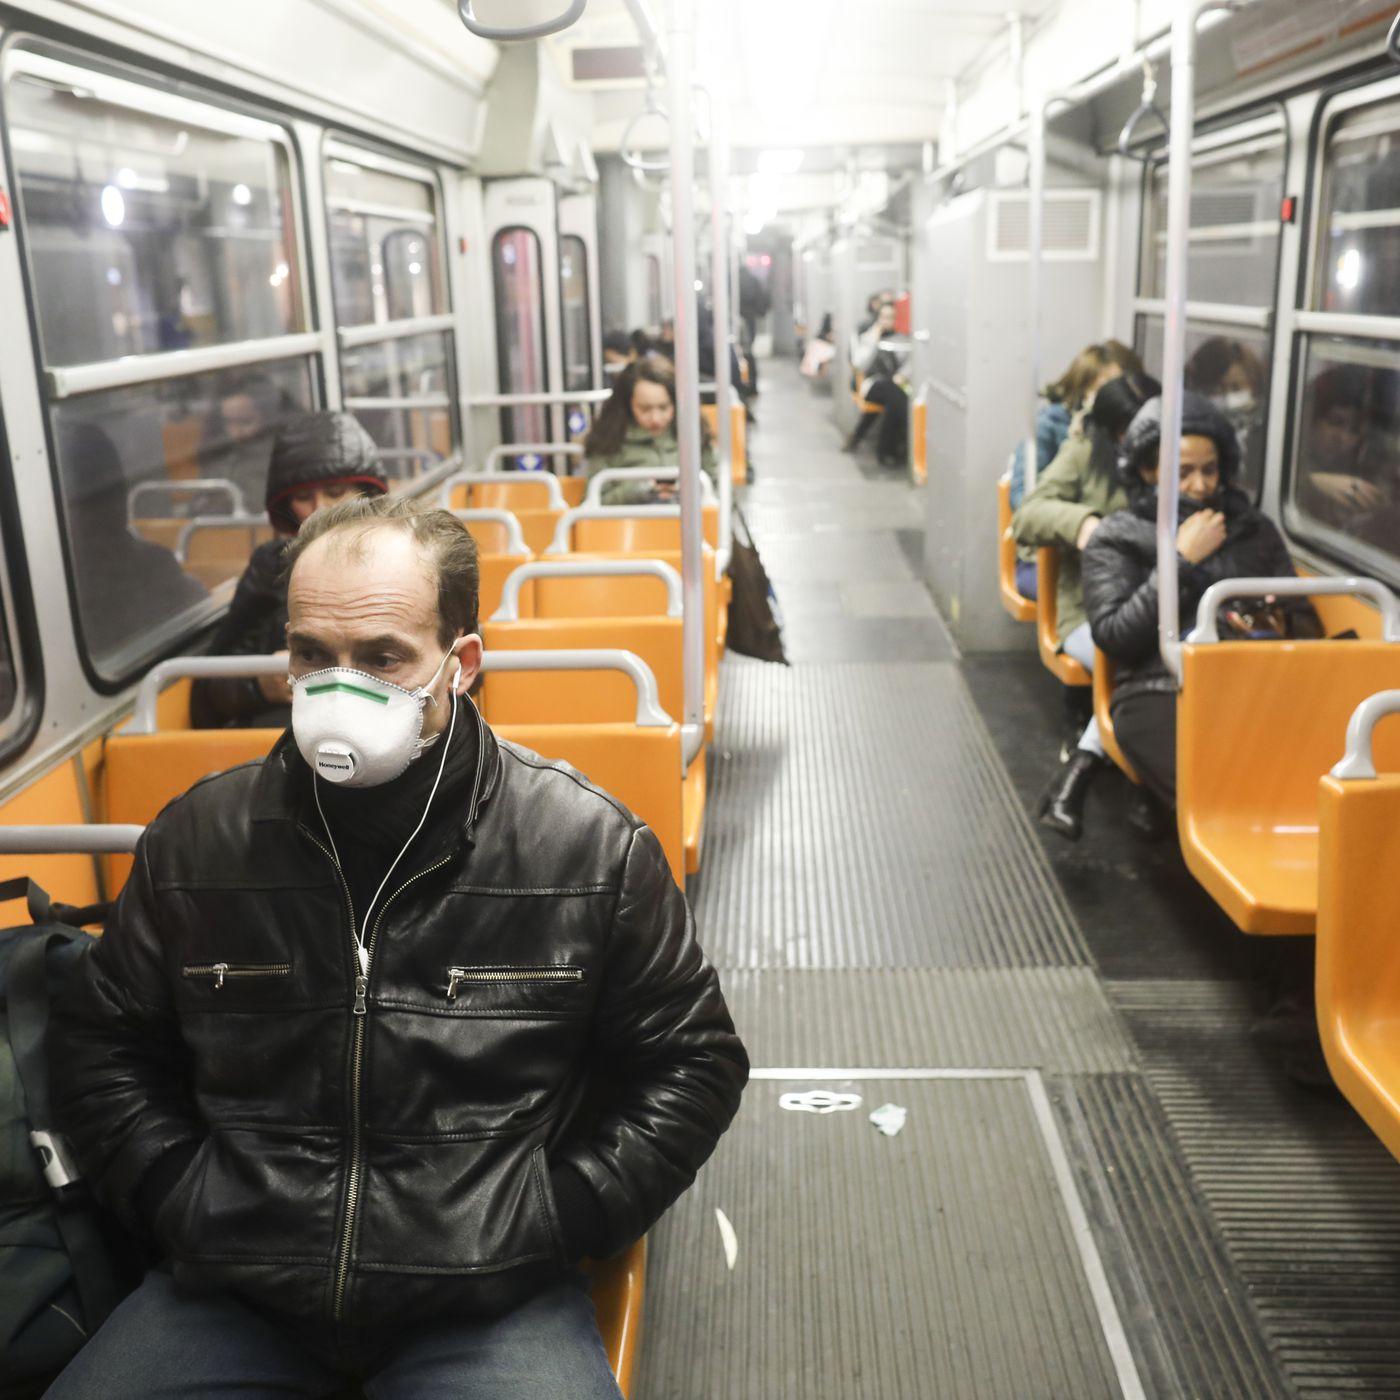 Coronavirus outbreak: How Facebook, Twitter, YouTube, and TikTok ...